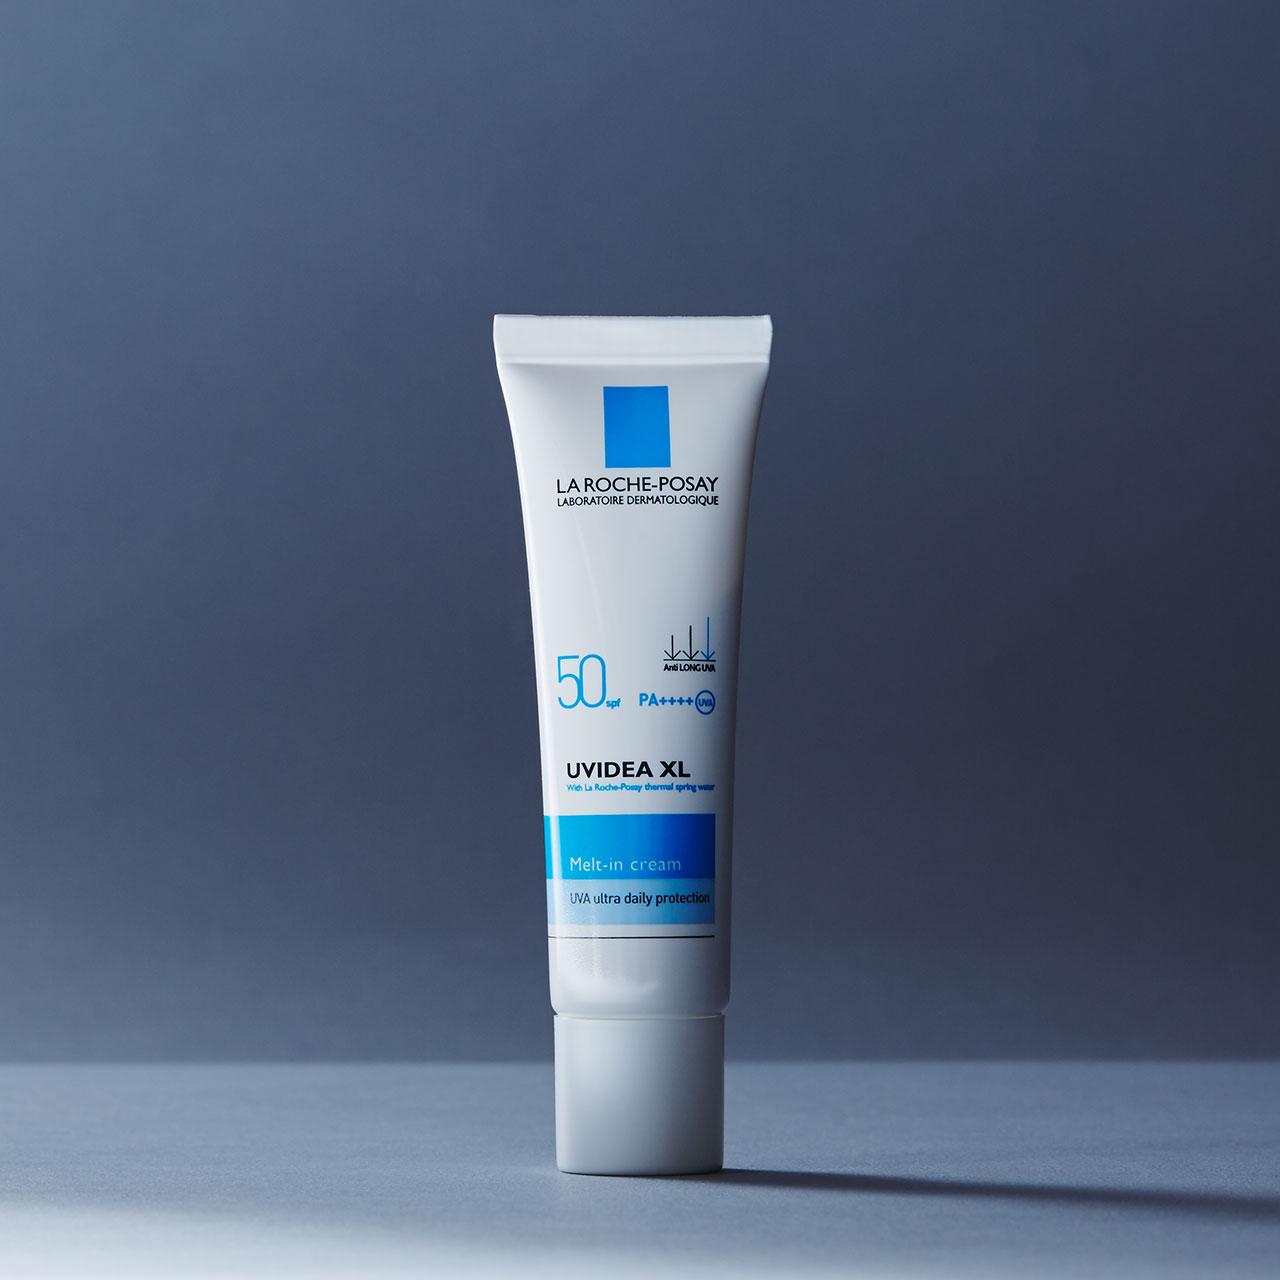 LA ROCHE-POSAY UV イデア XL SPF50 PA++++ 30g ¥3,400